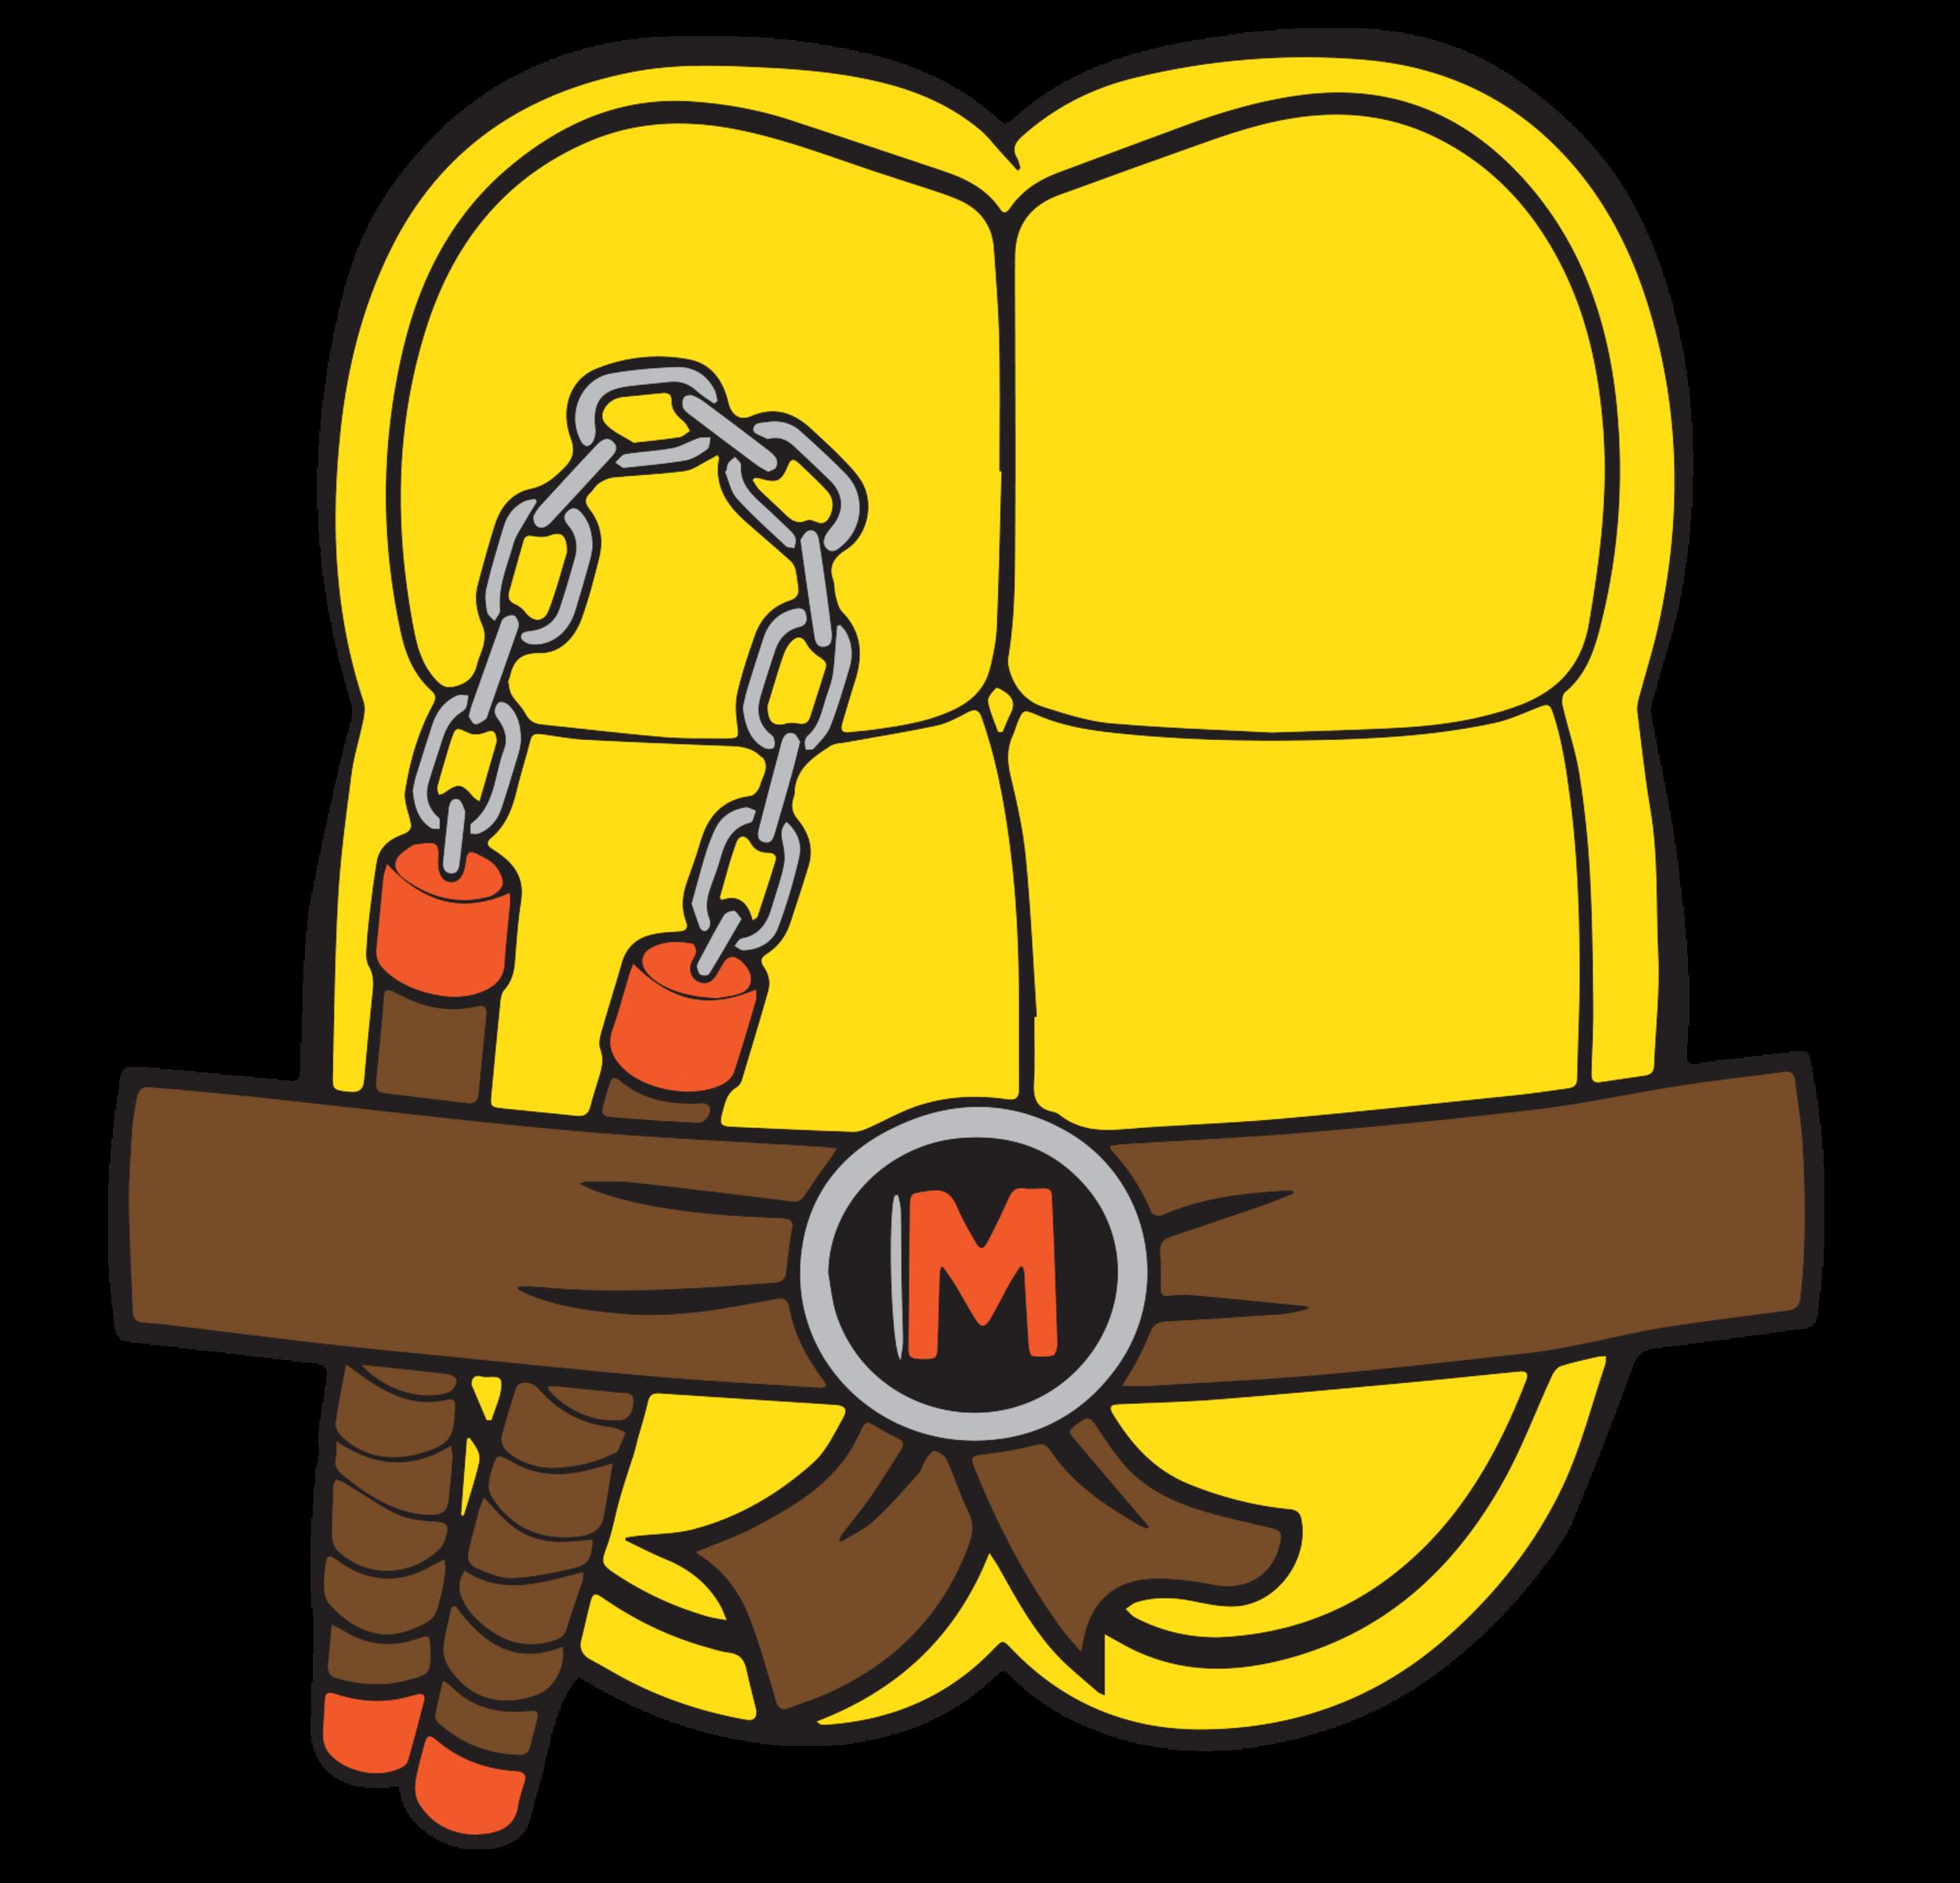 Free Ninja Turtle Clipart, Download Free Clip Art, Free Clip.